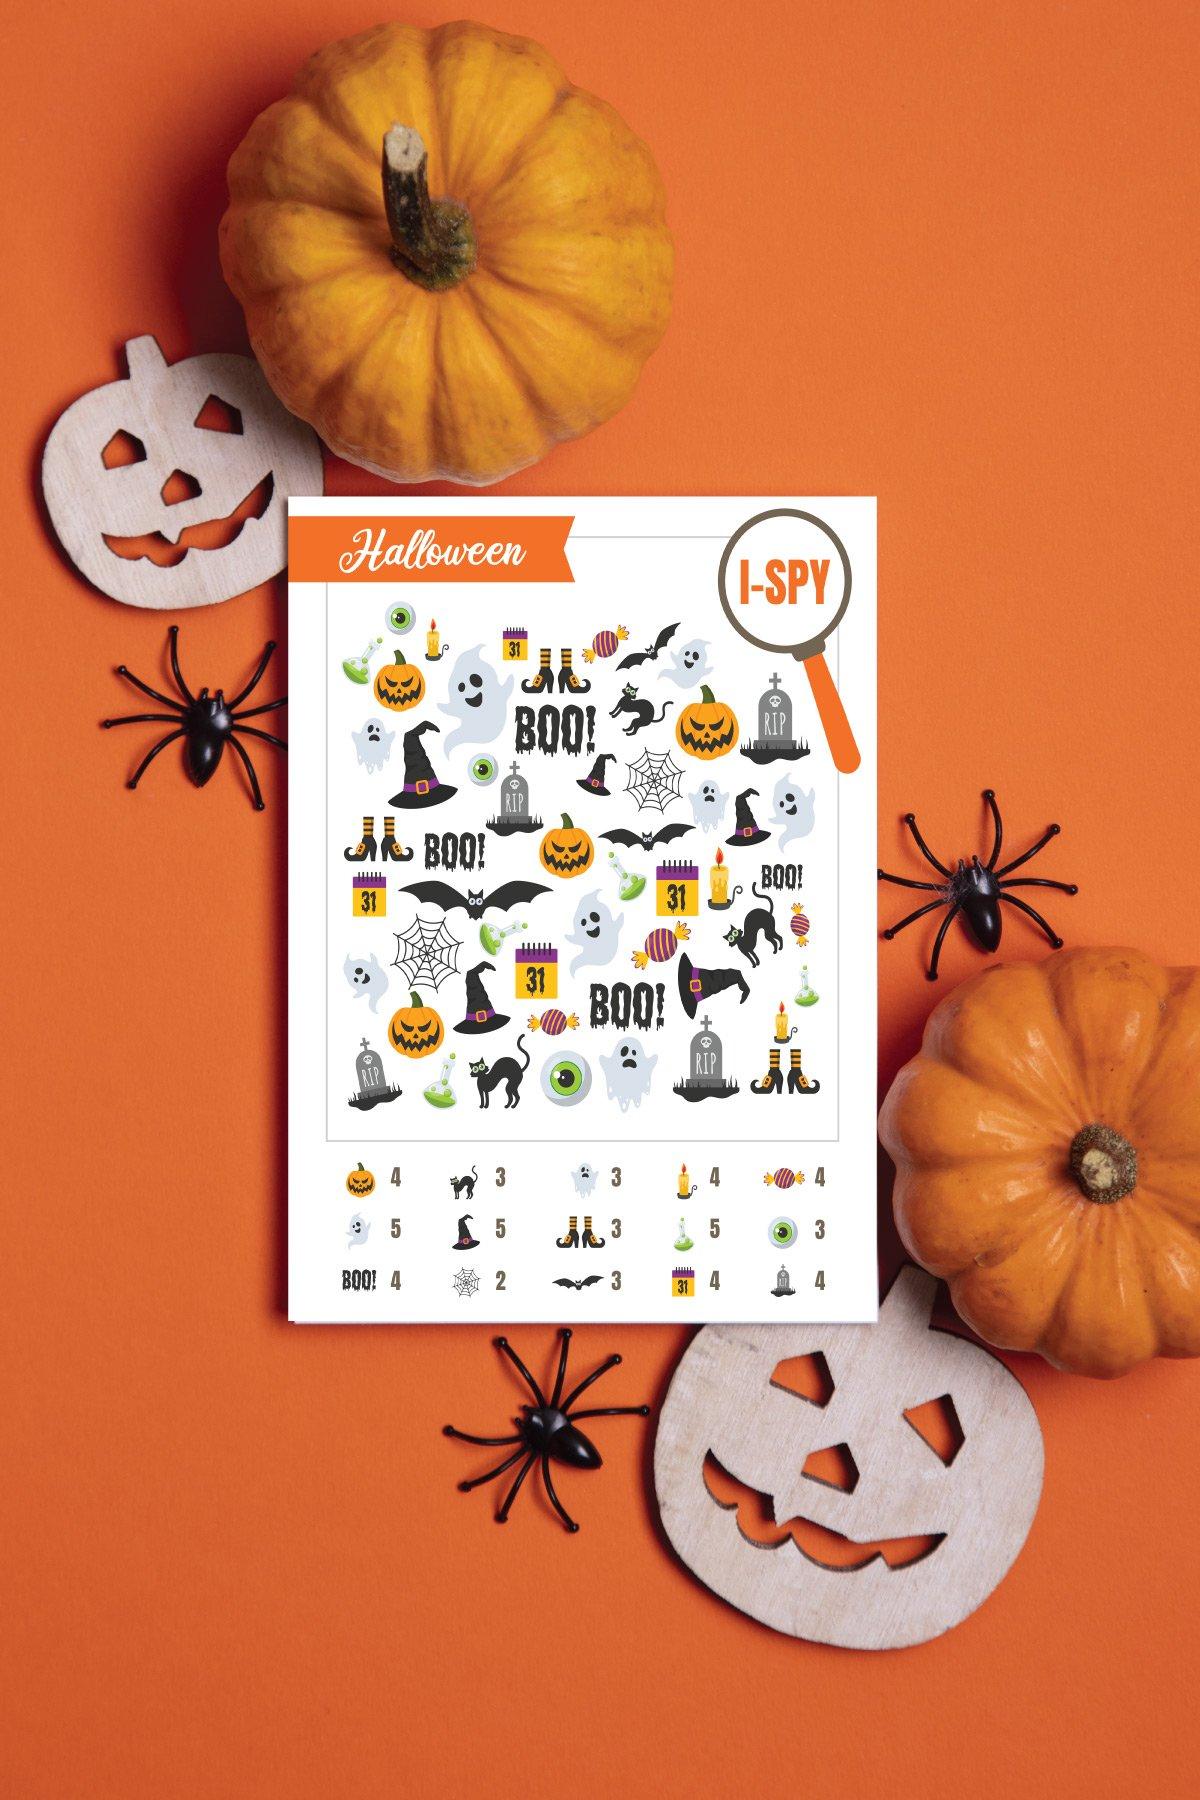 Halloween i spy on an orange background